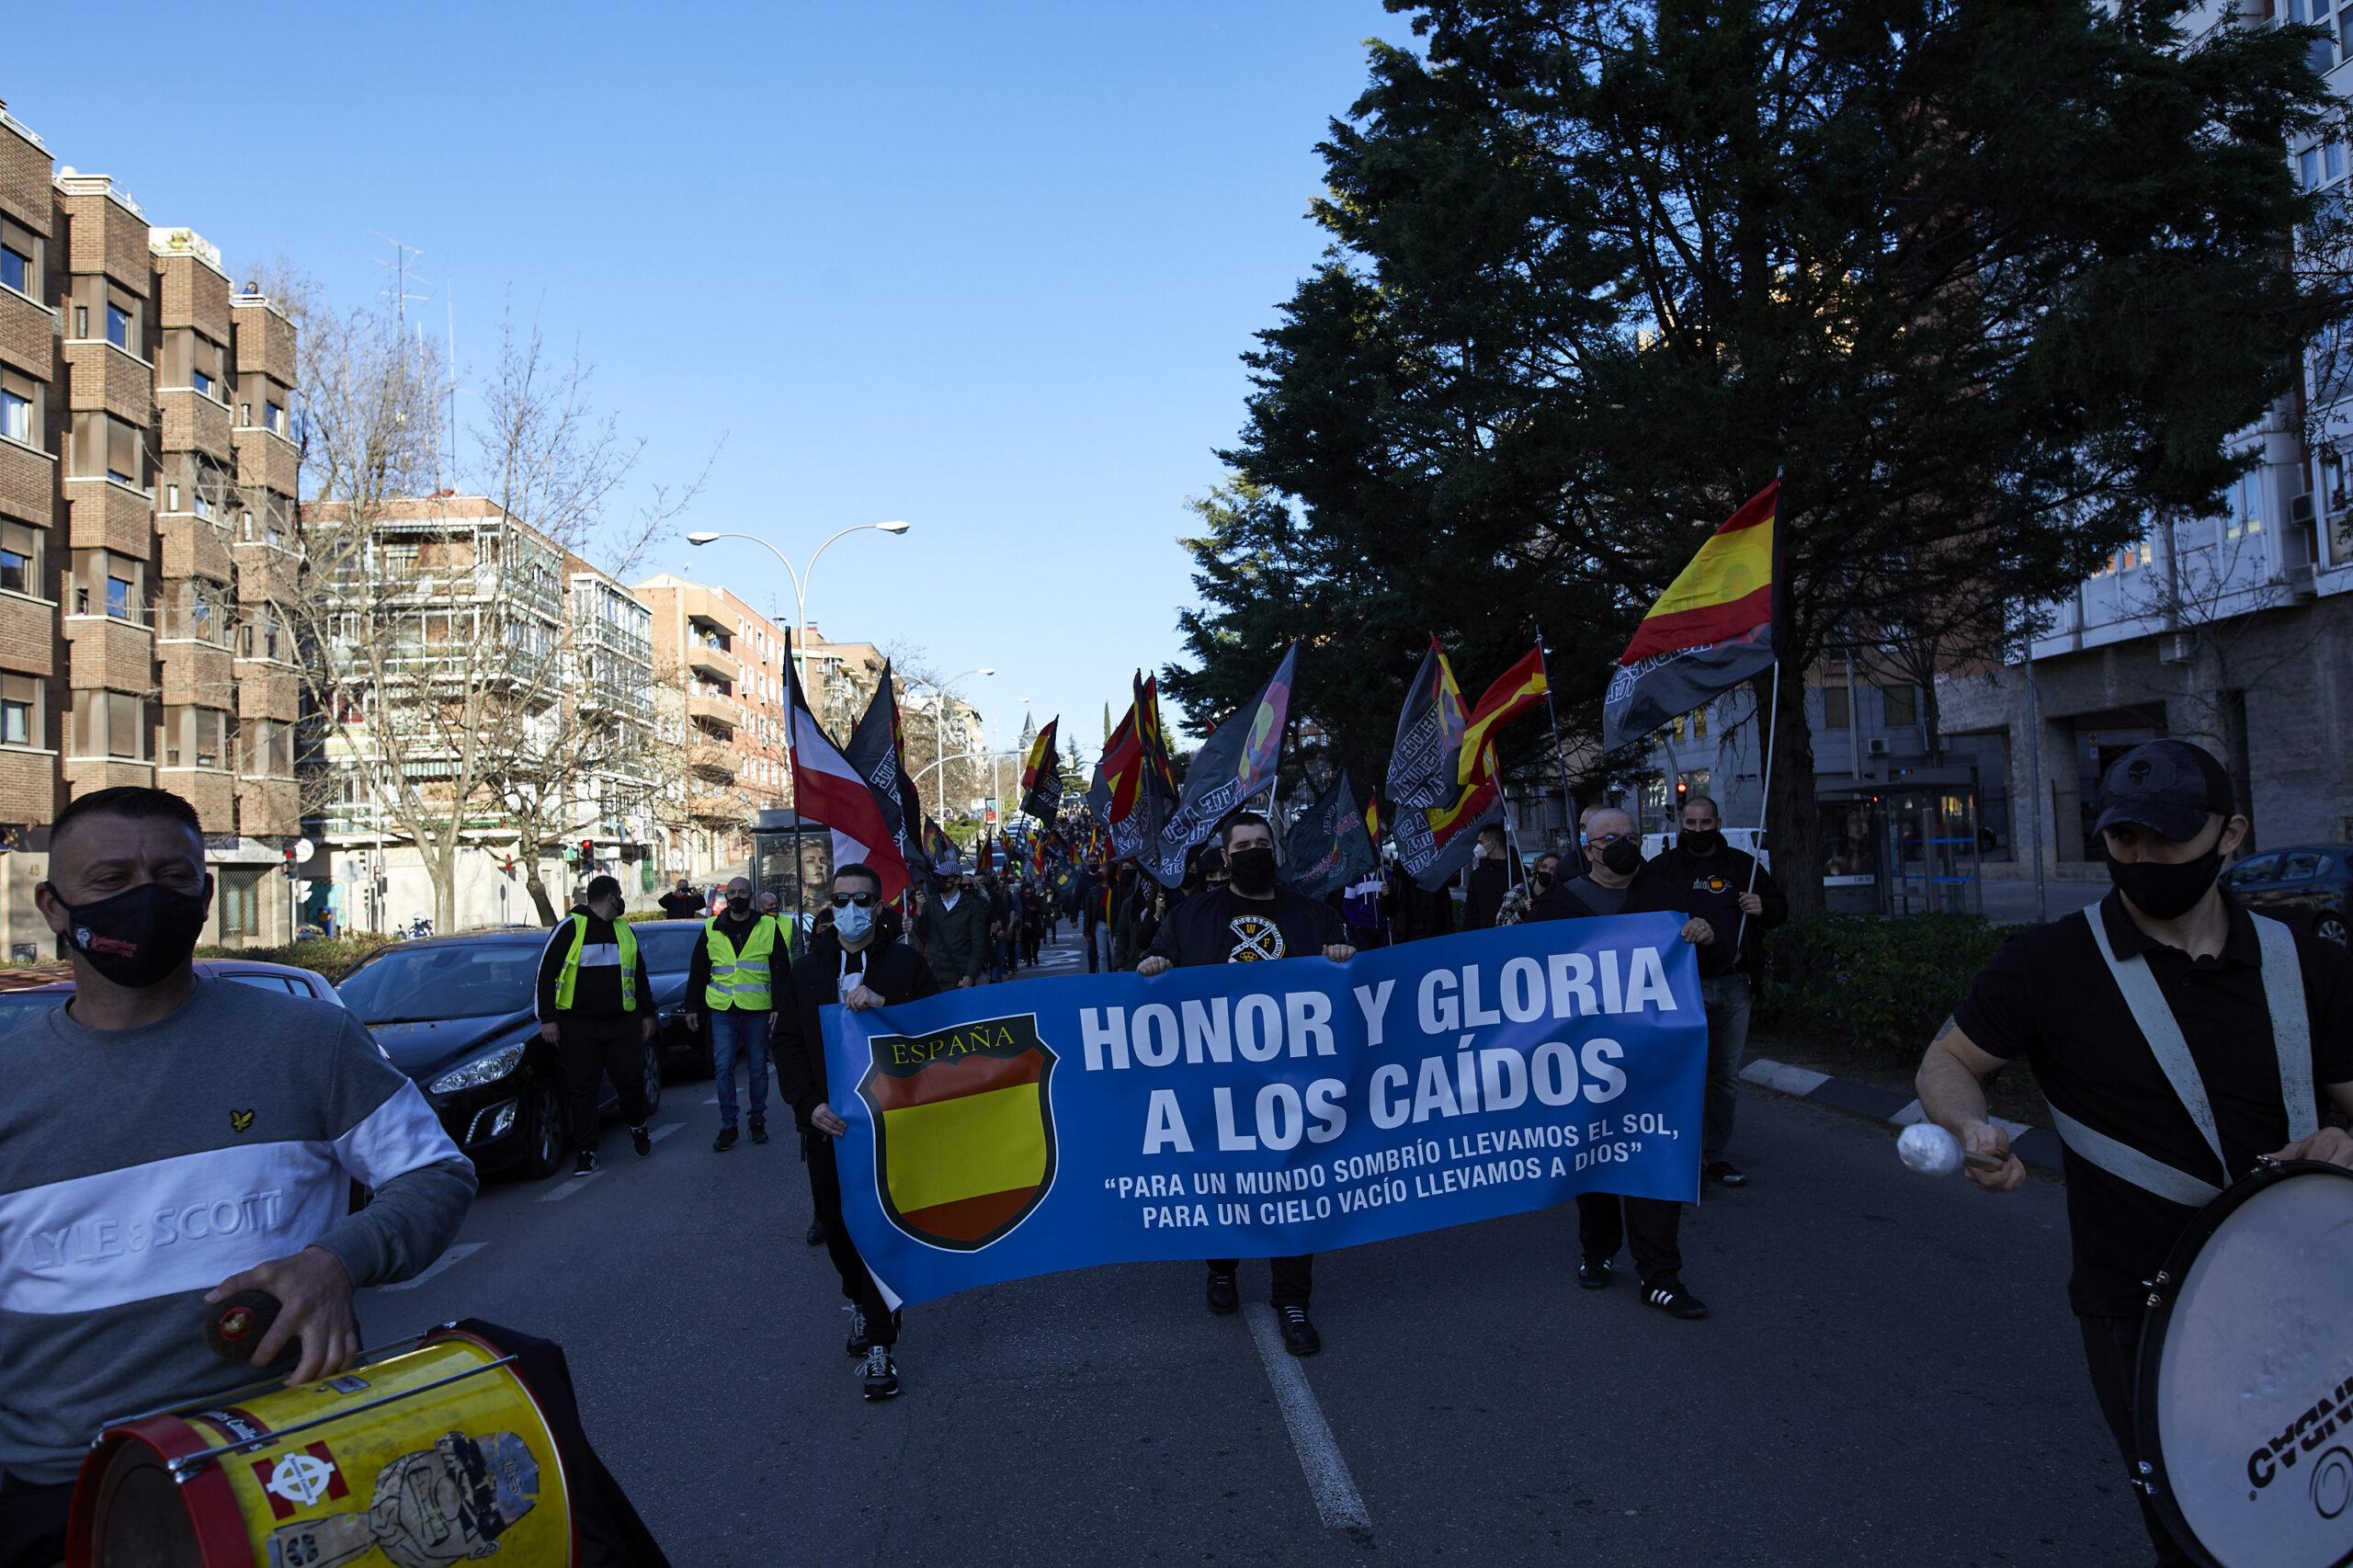 Diverses persones participen en una marxa neonazi a Madrid. Jesús Hellín / Europa Press